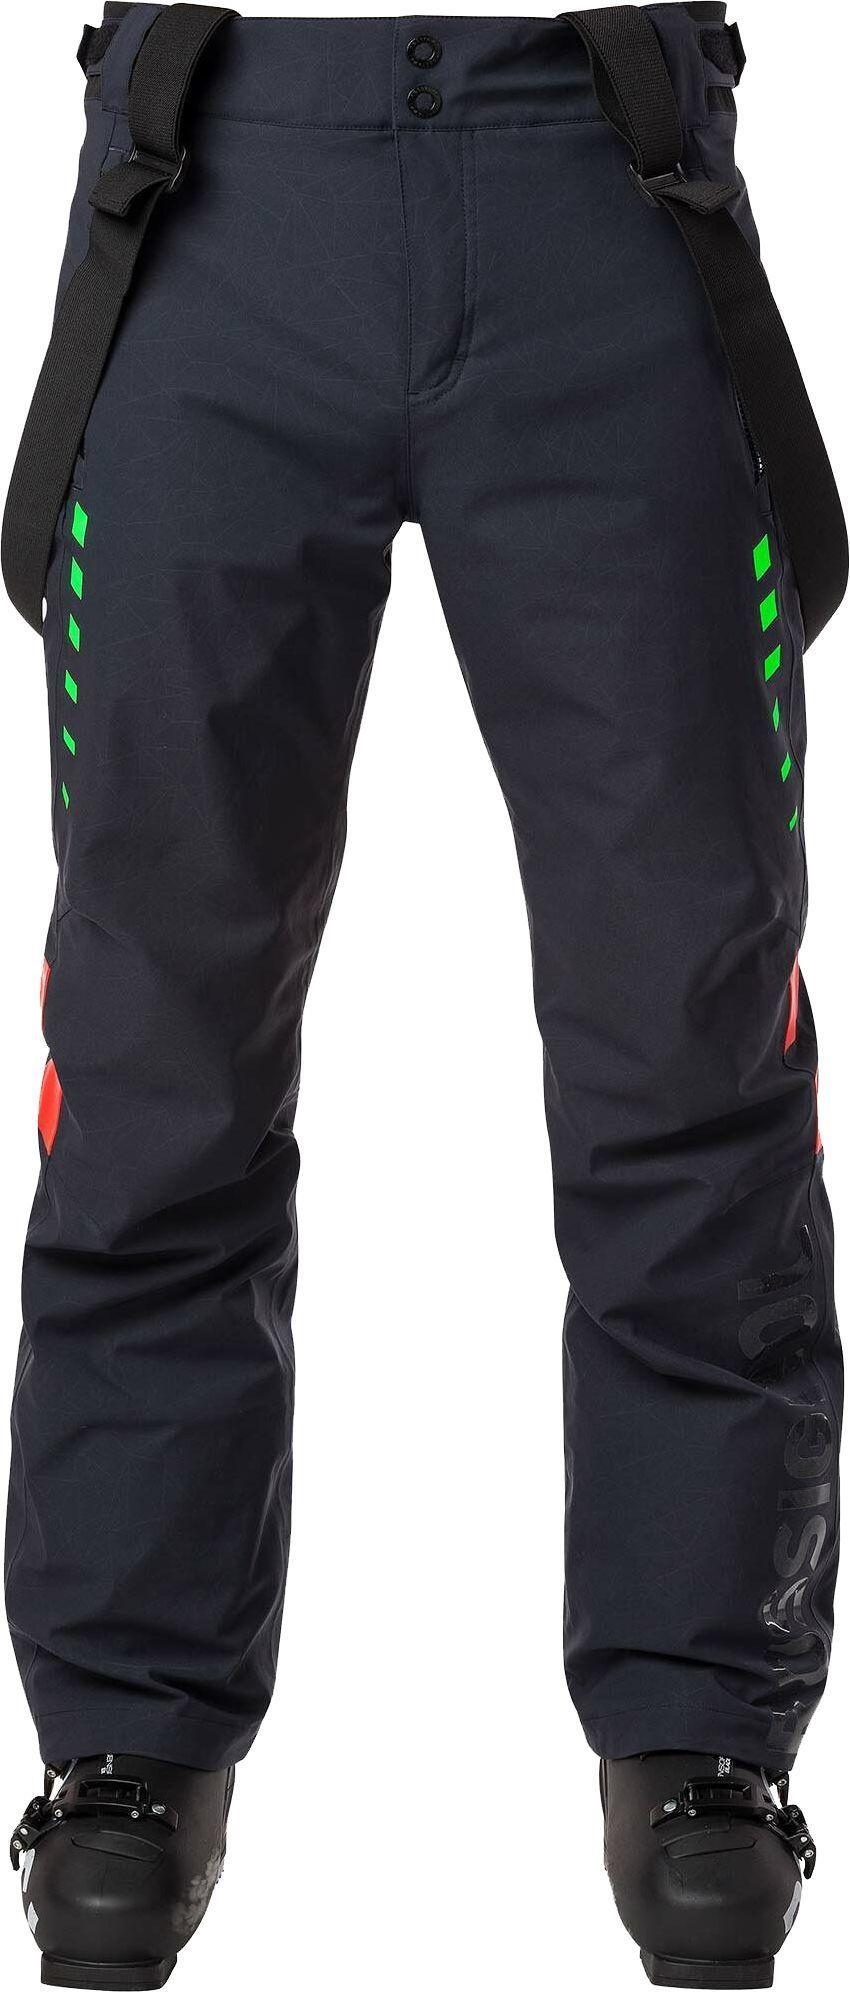 pantalones Rossignol Hero